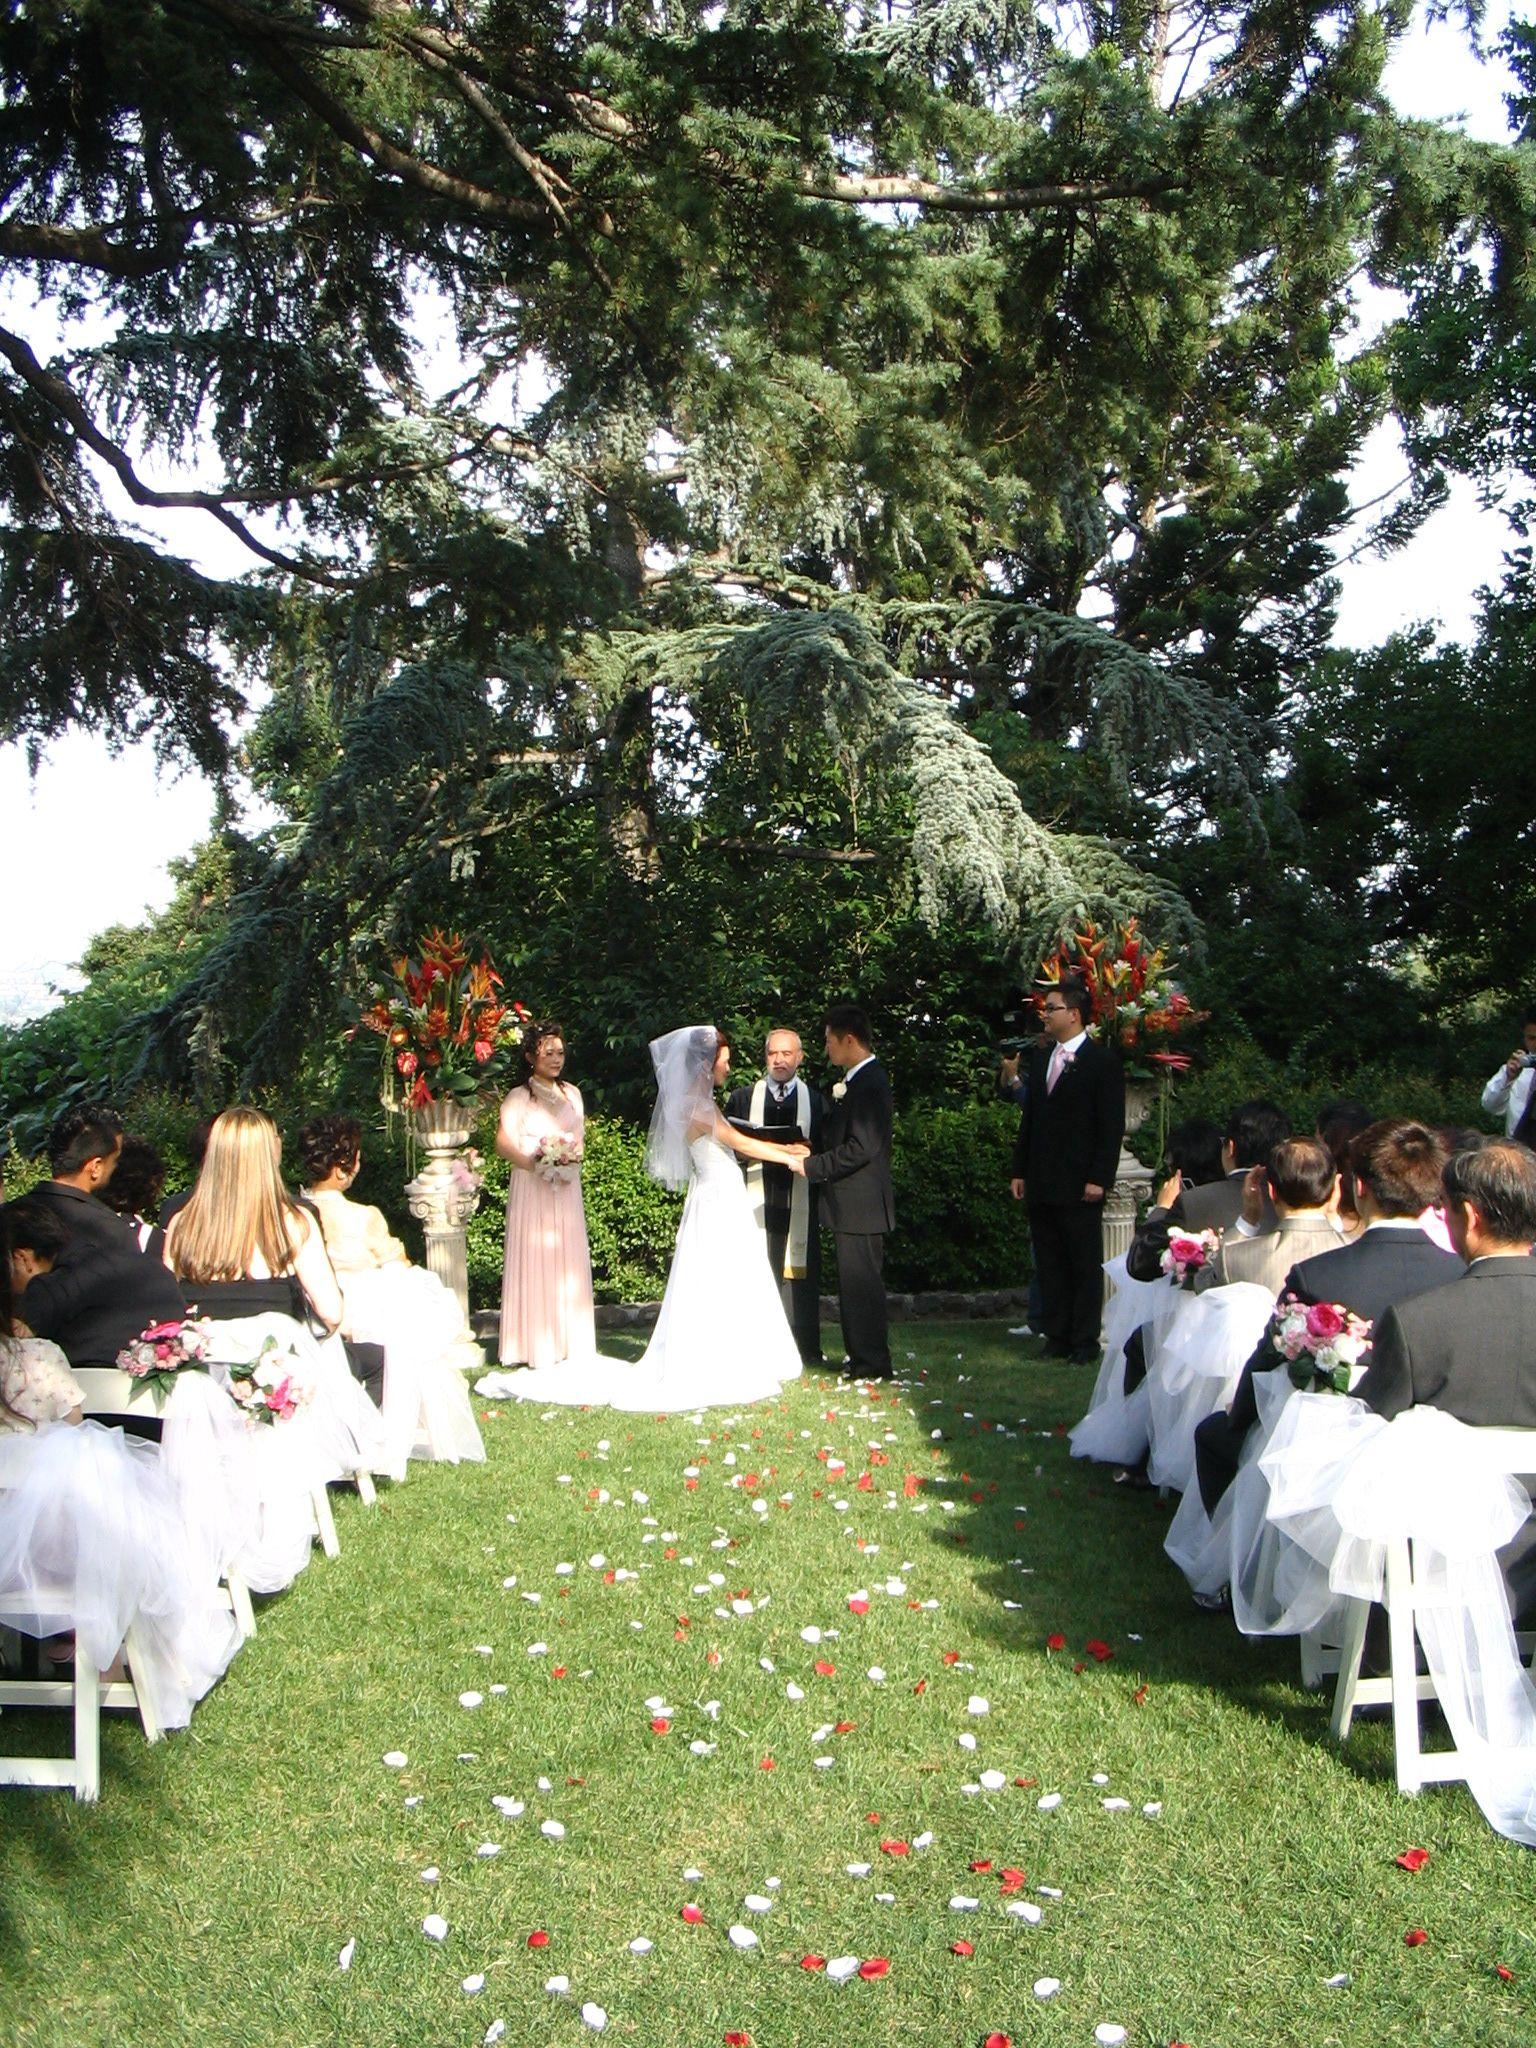 Perfect Wedding Venue: Stunning Garden Setting in Pomona ...